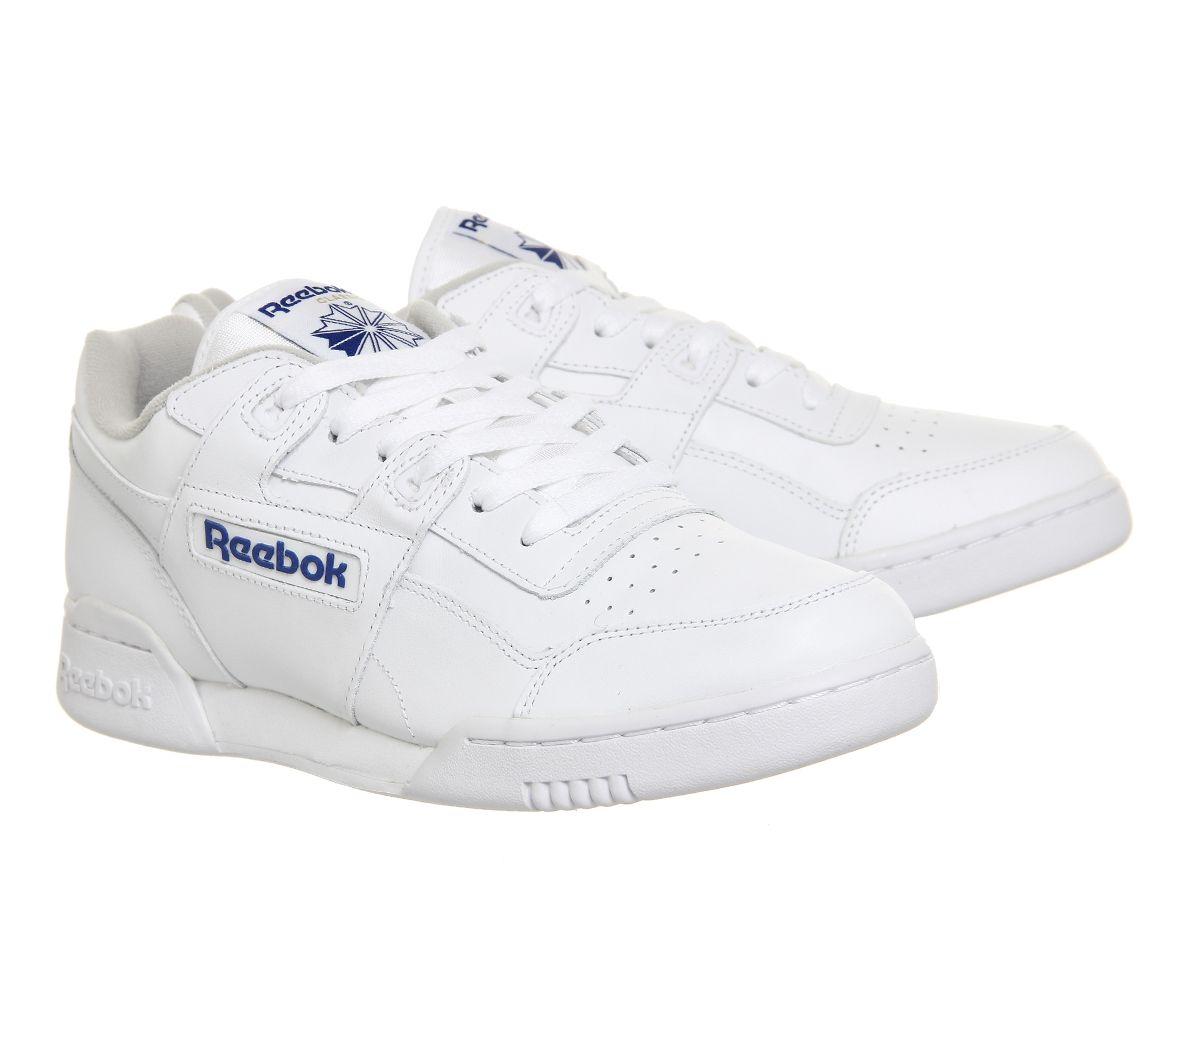 09265edd9 Reebok Workout Plus White Royal - His trainers